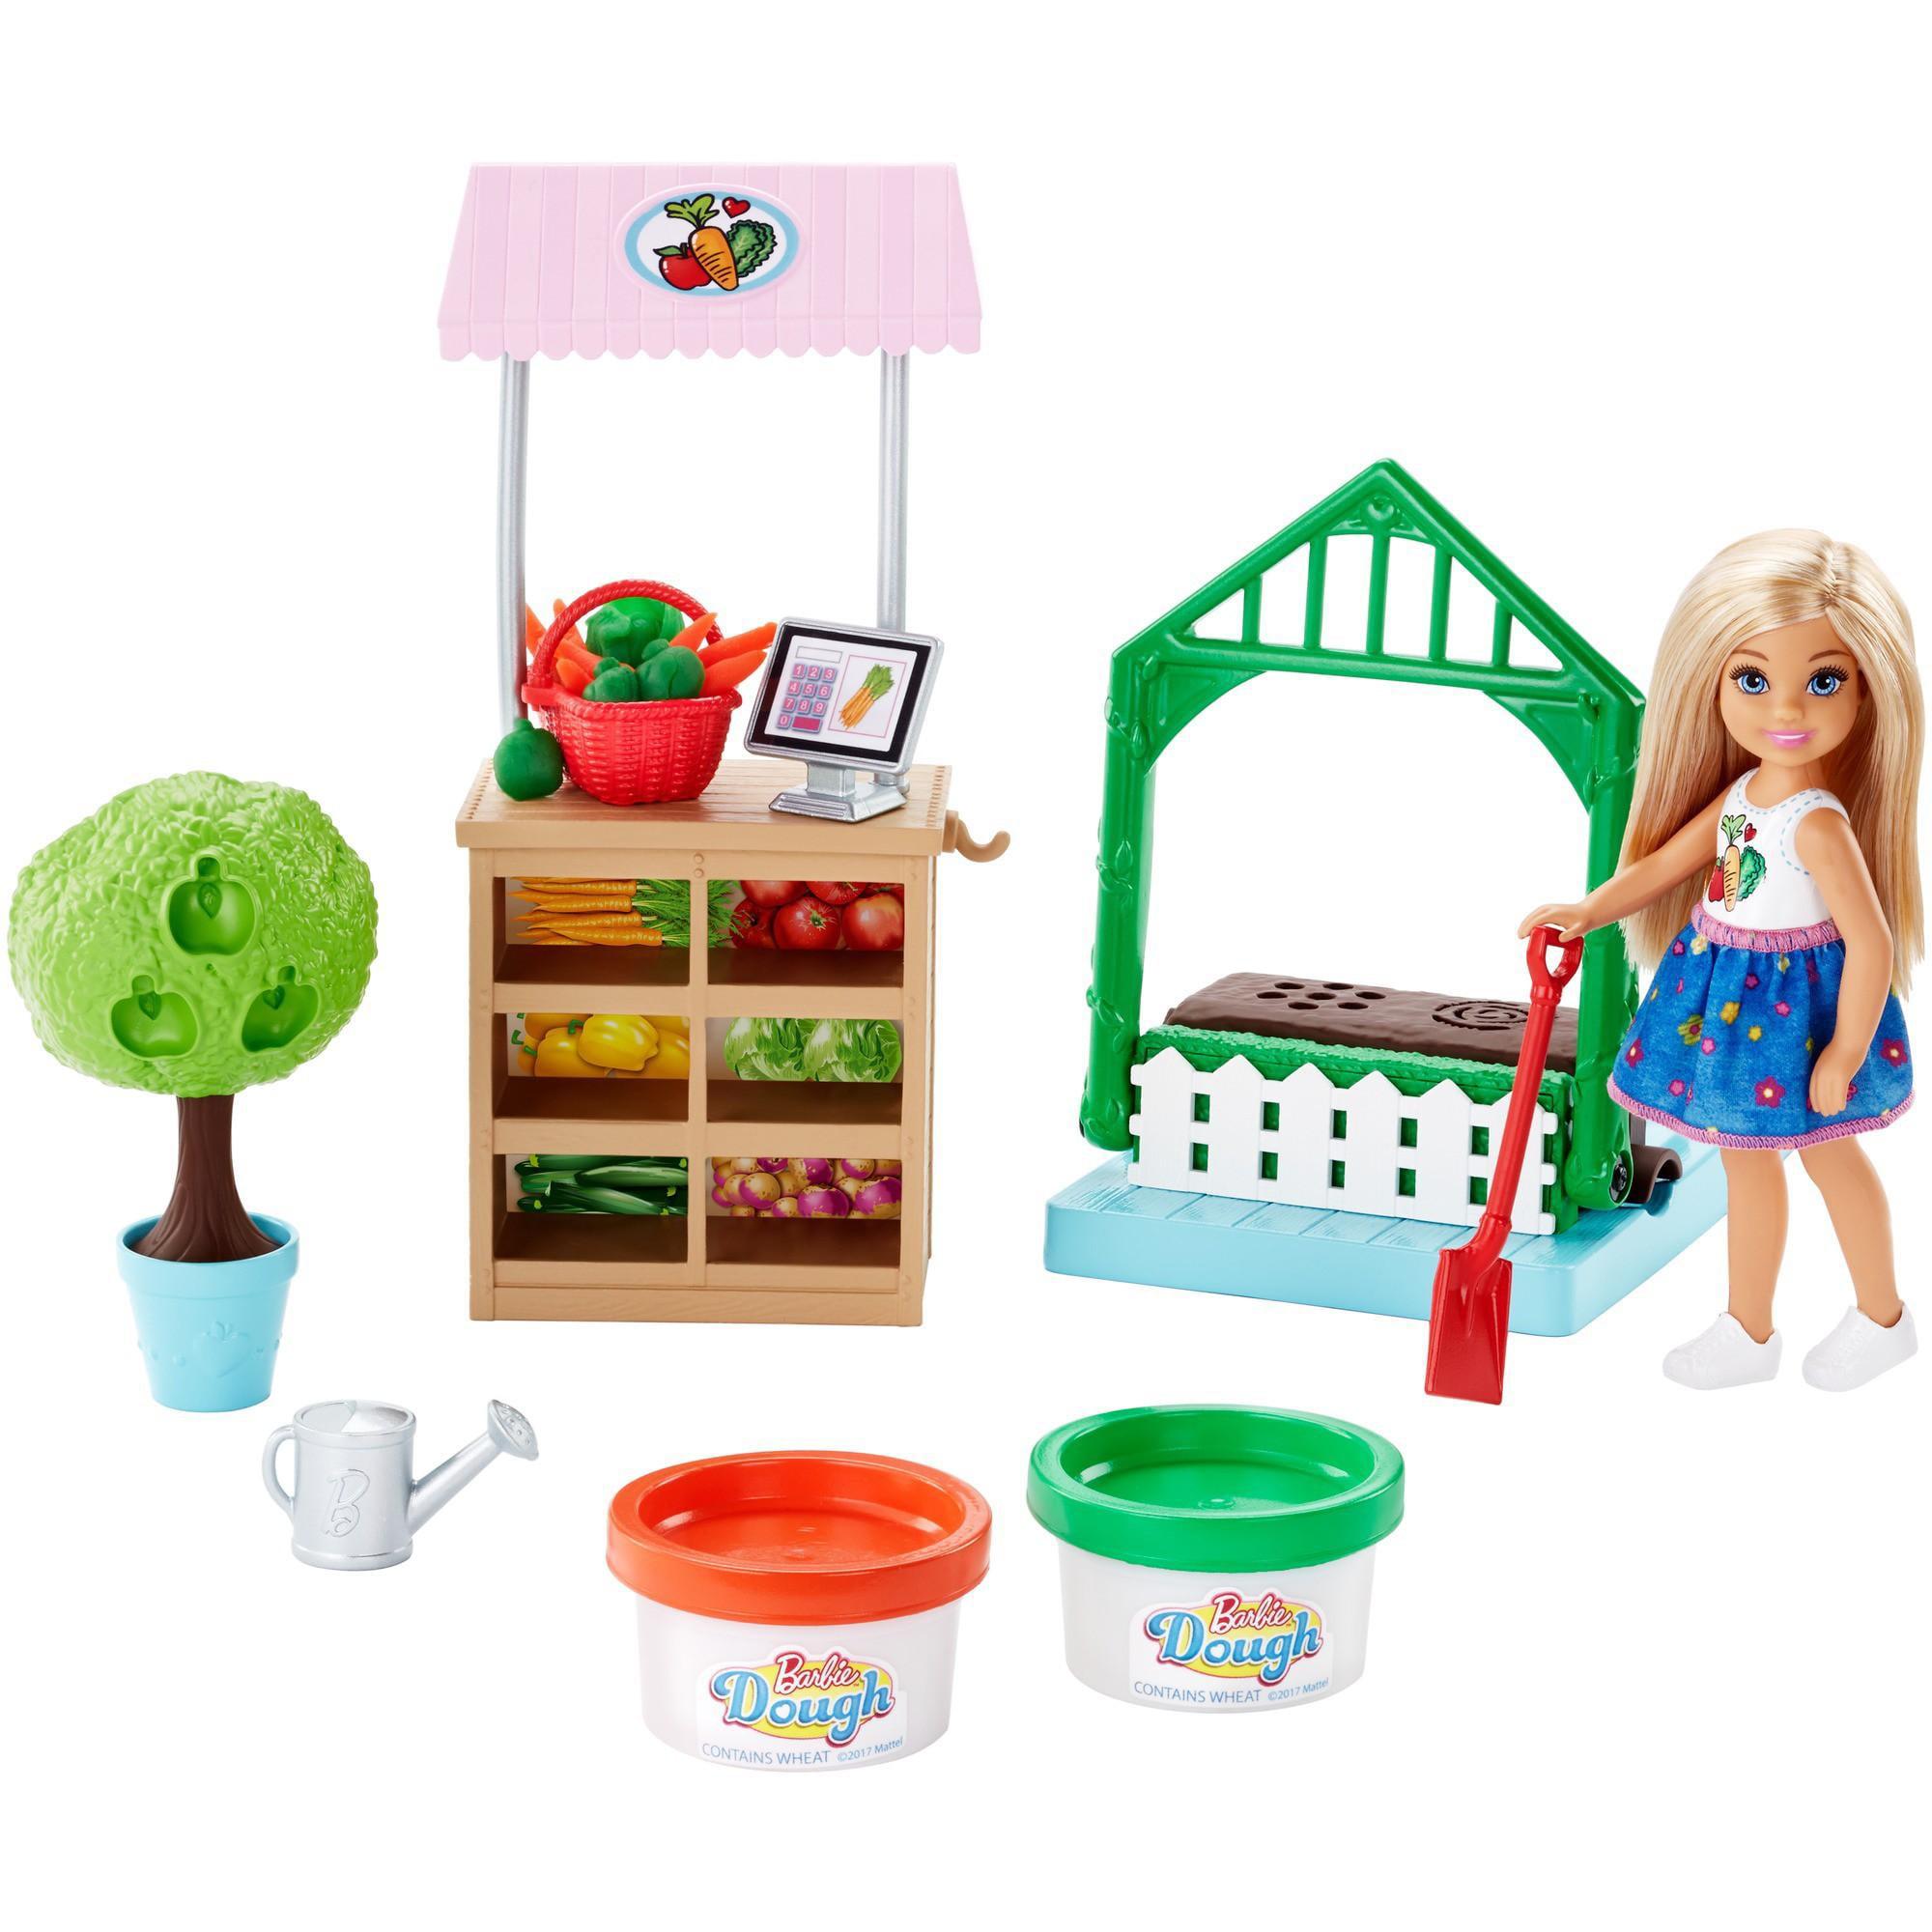 Barbie Chelsea Cooking & Baking Veggie Garden Doll & Playset